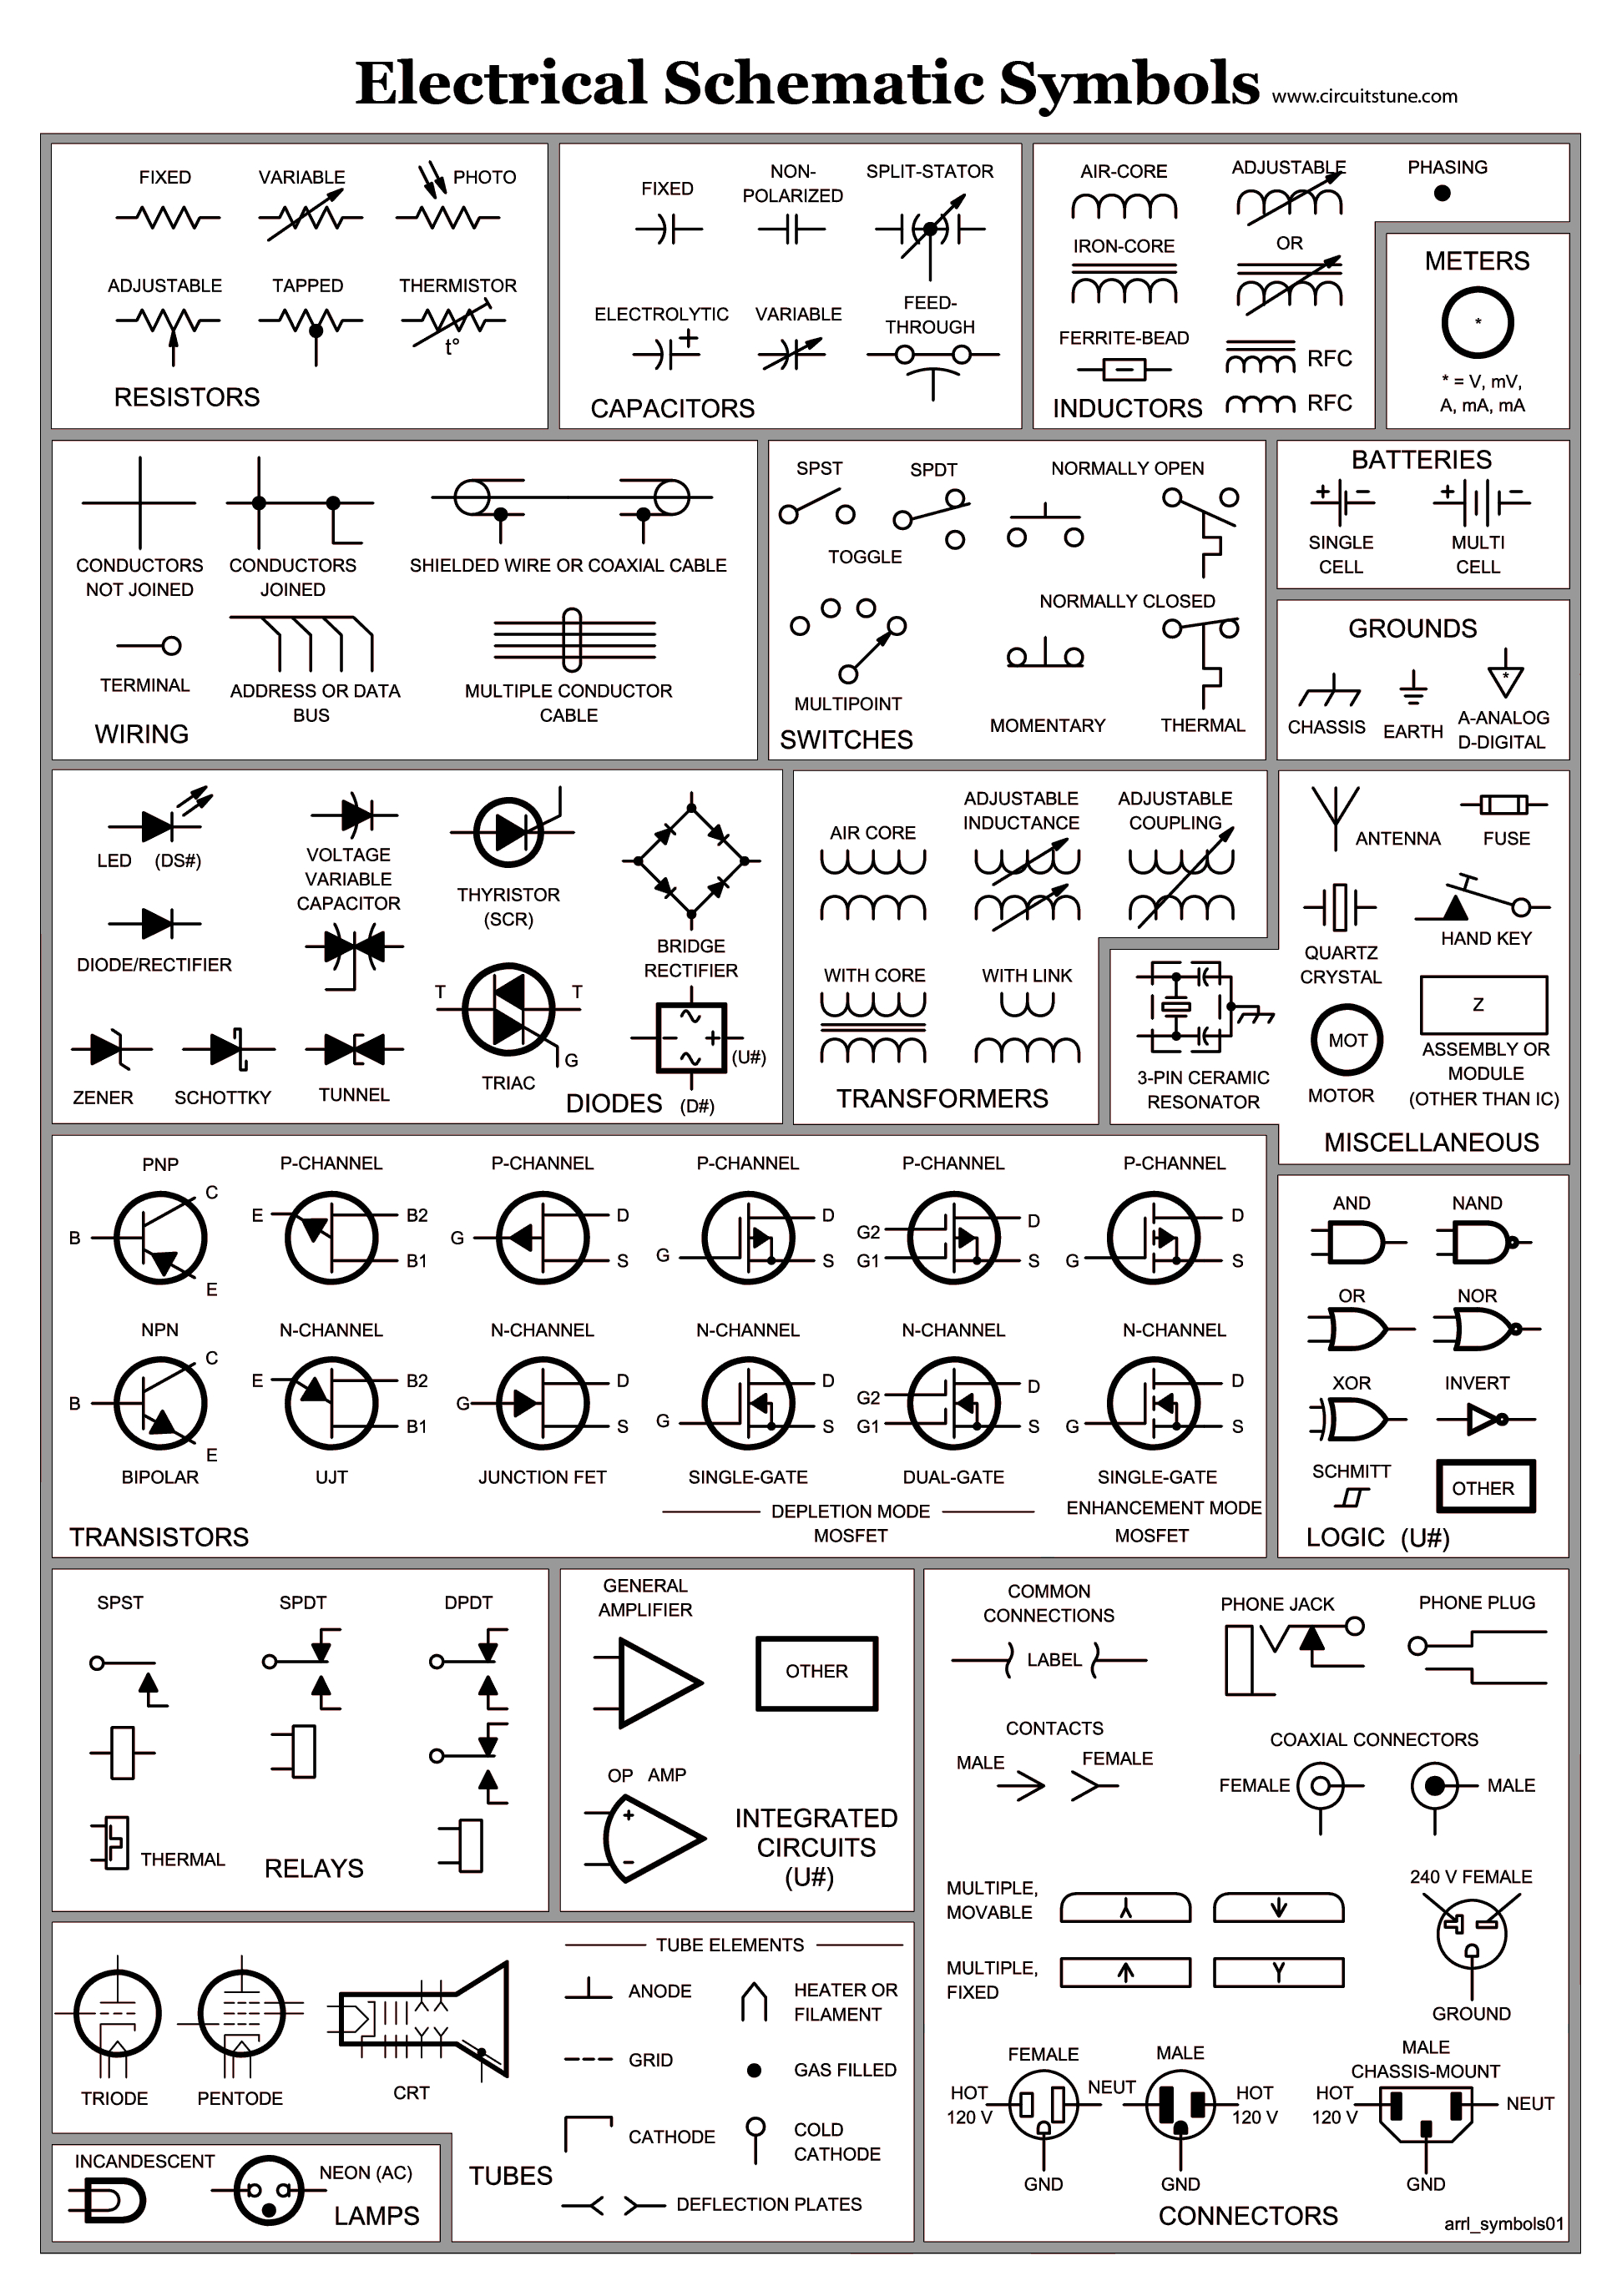 Electrical Schematic Symbols | Skinsquiggles | Pinterest - Wiring Diagram Symbols